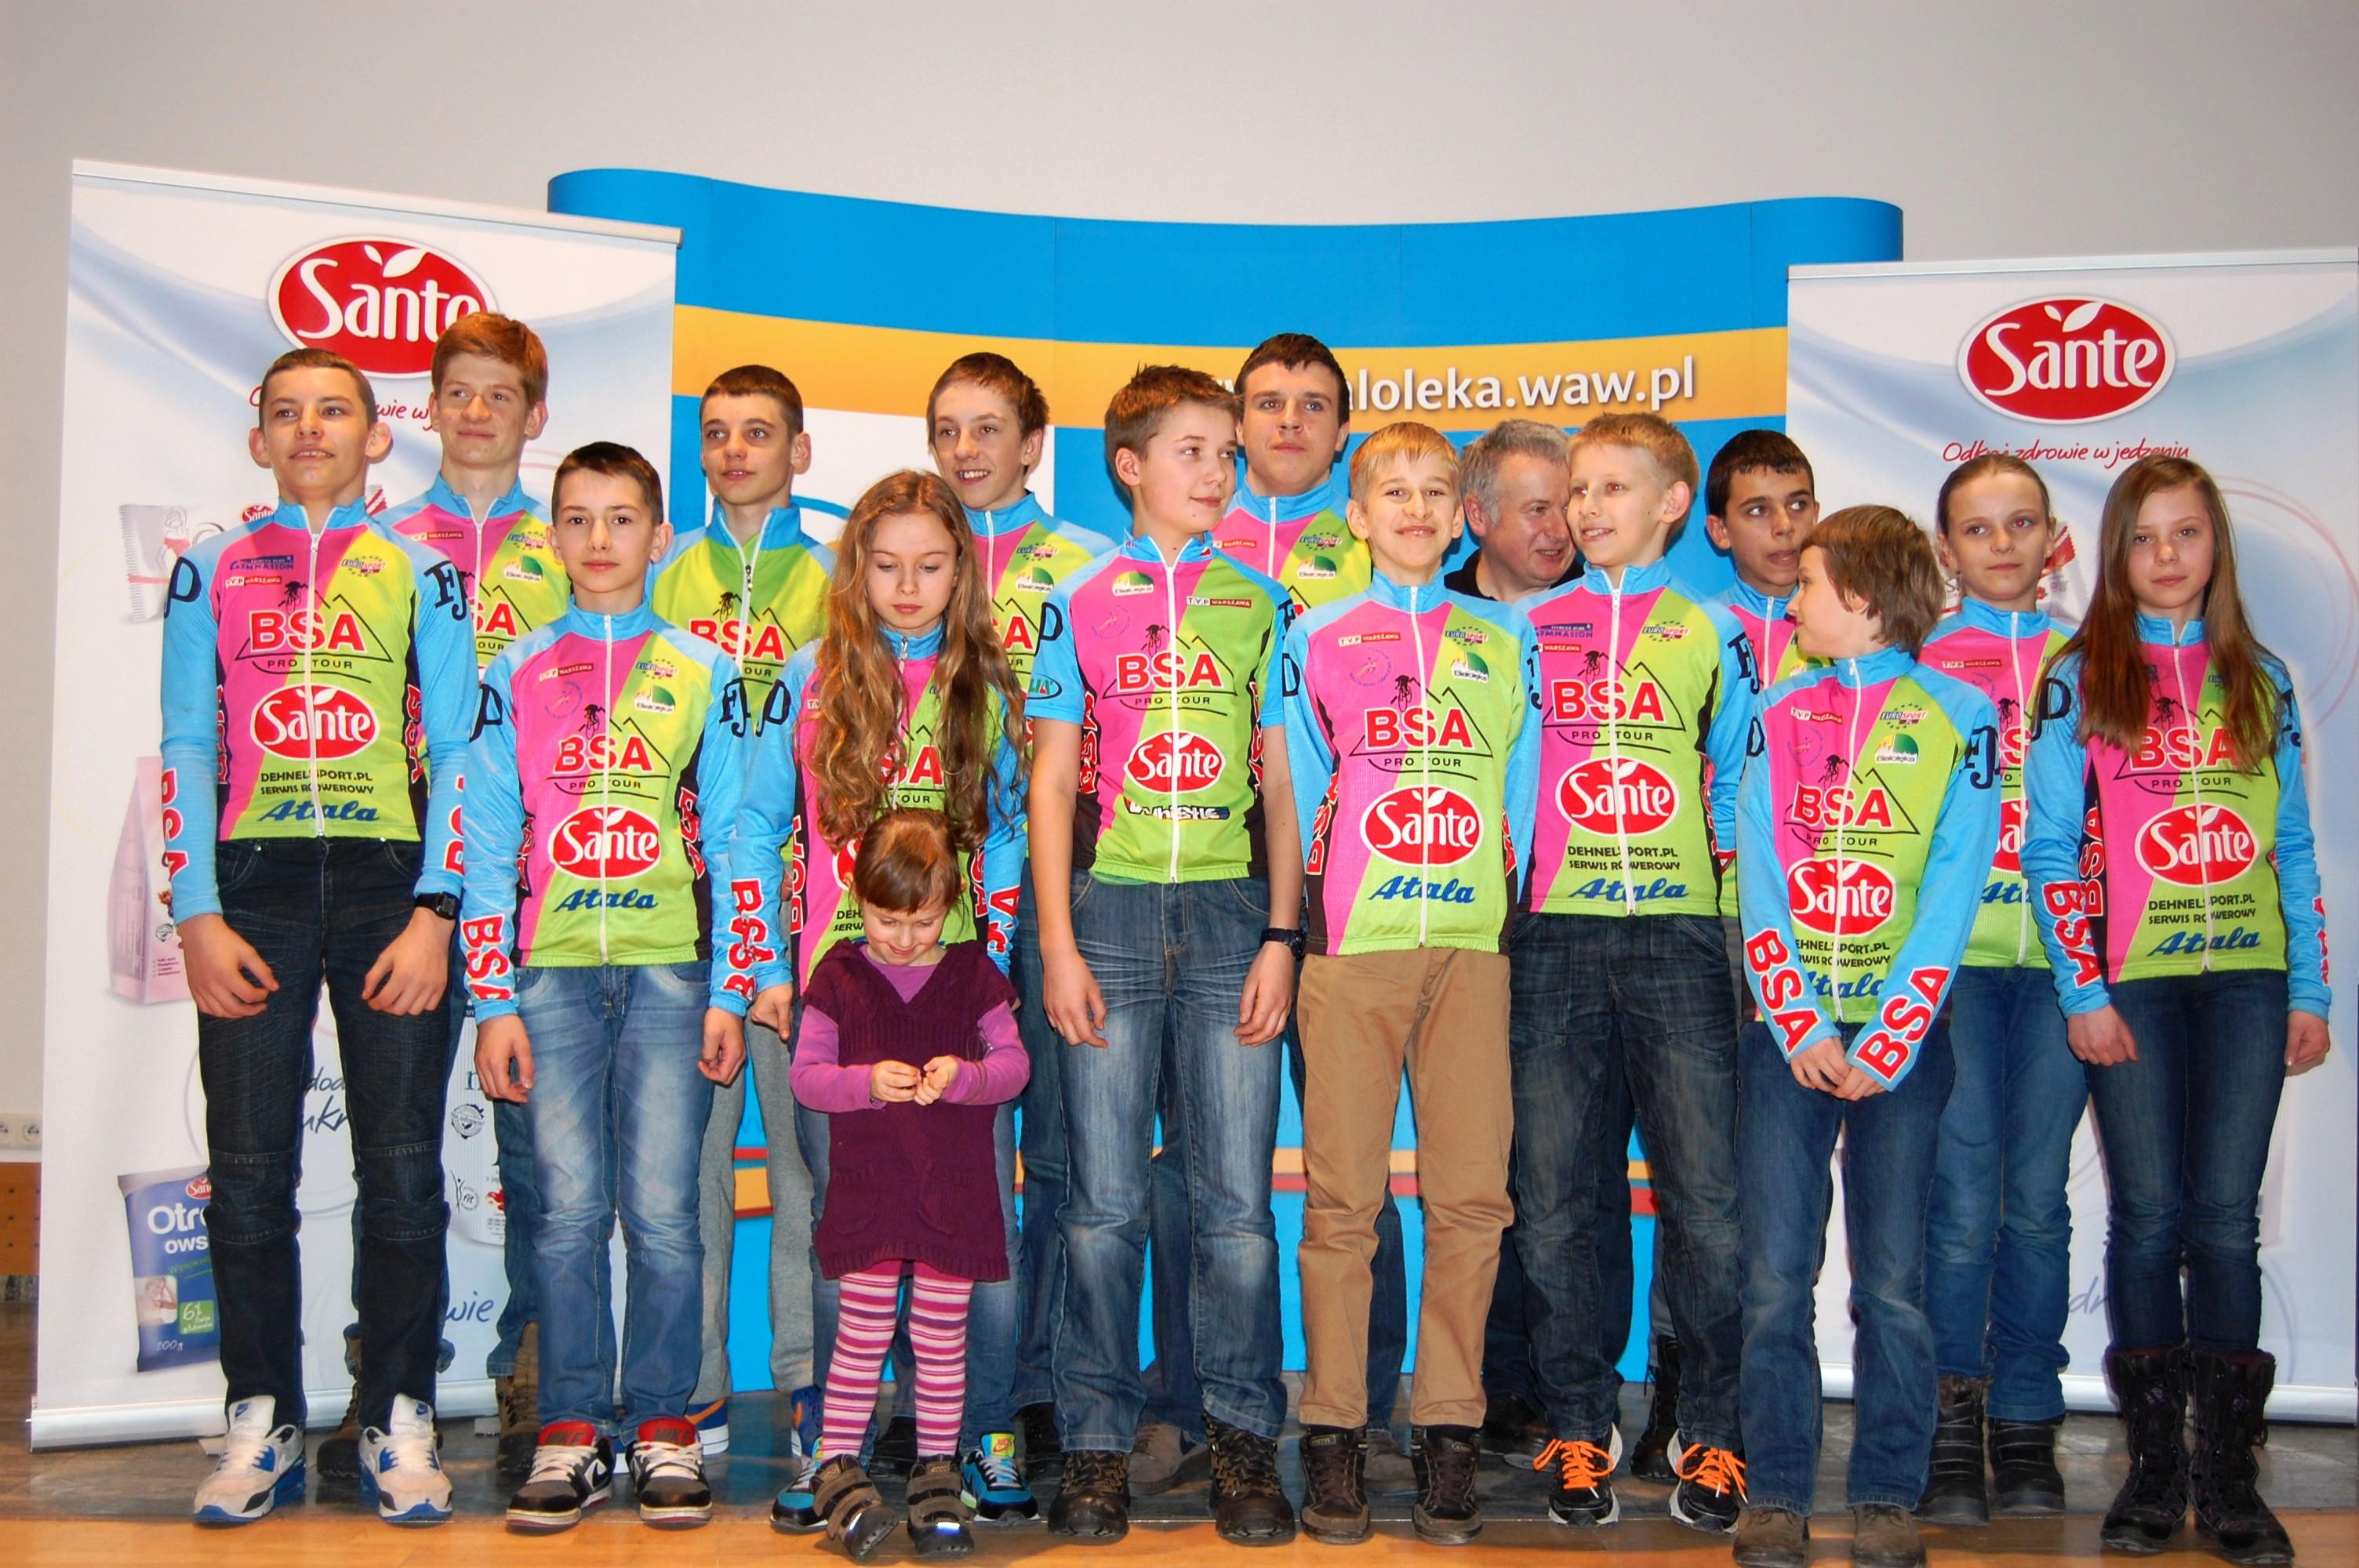 Firma SANTE tytularnym sponsorem grupy kolarskiej BSA